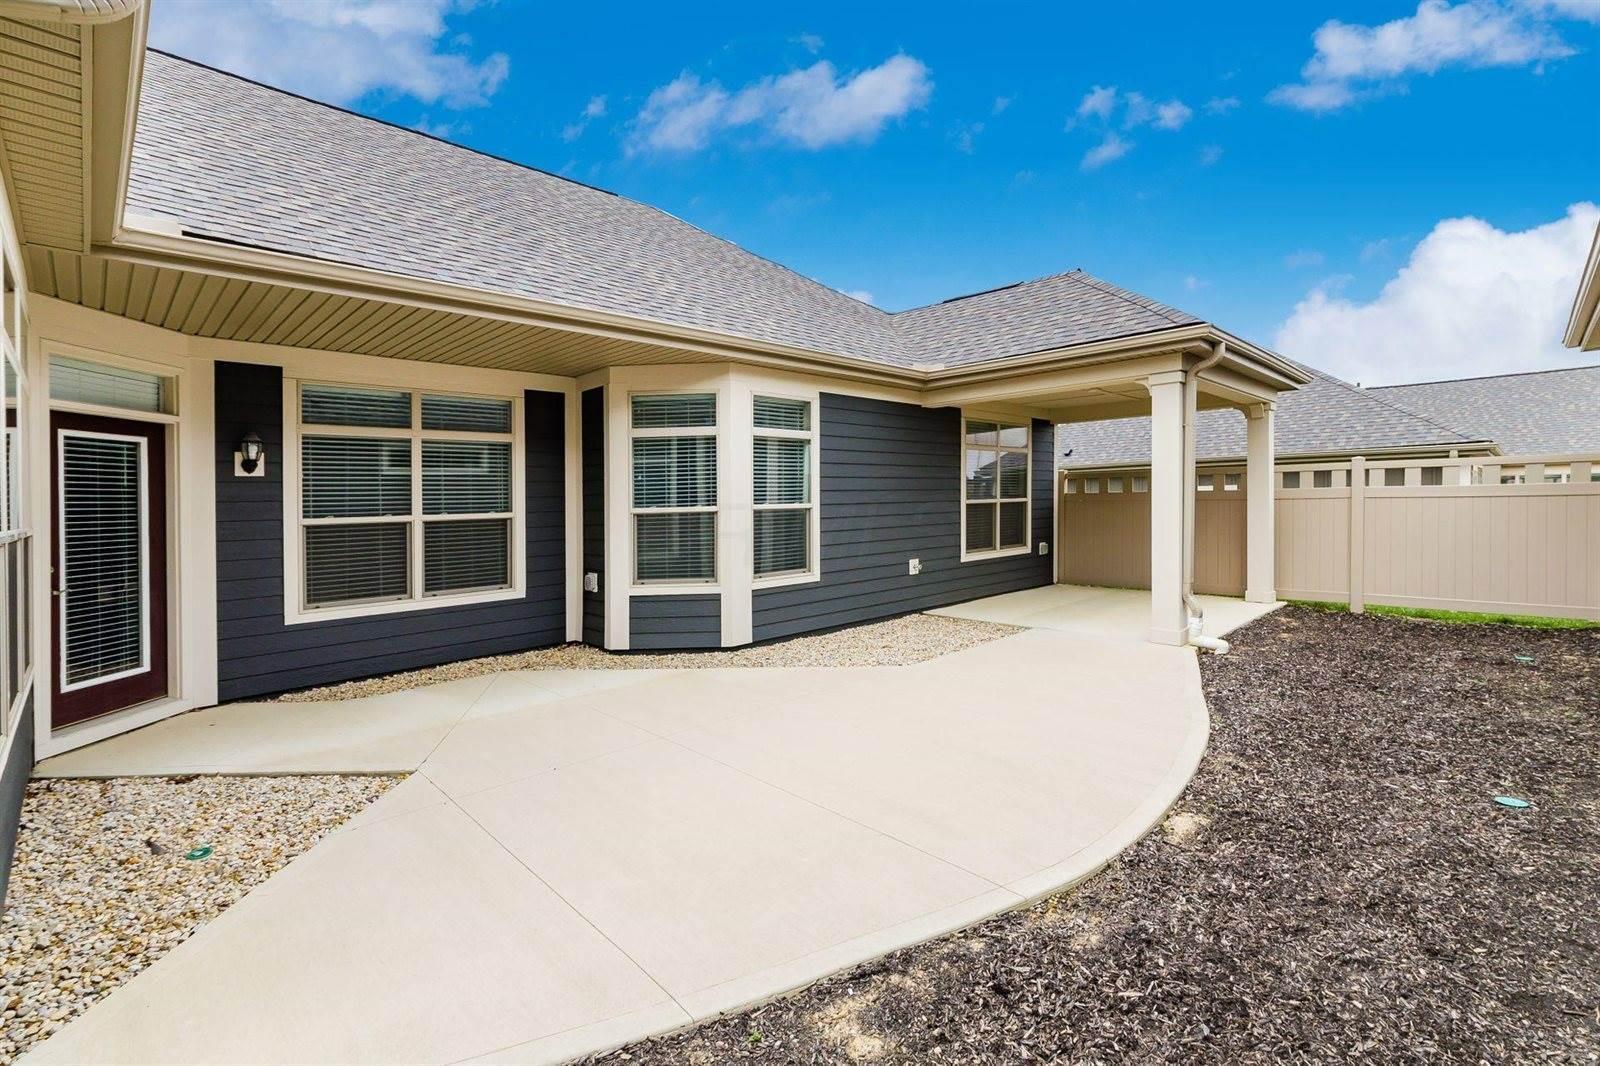 10508 Elderberry Drive, Plain City, OH 43064